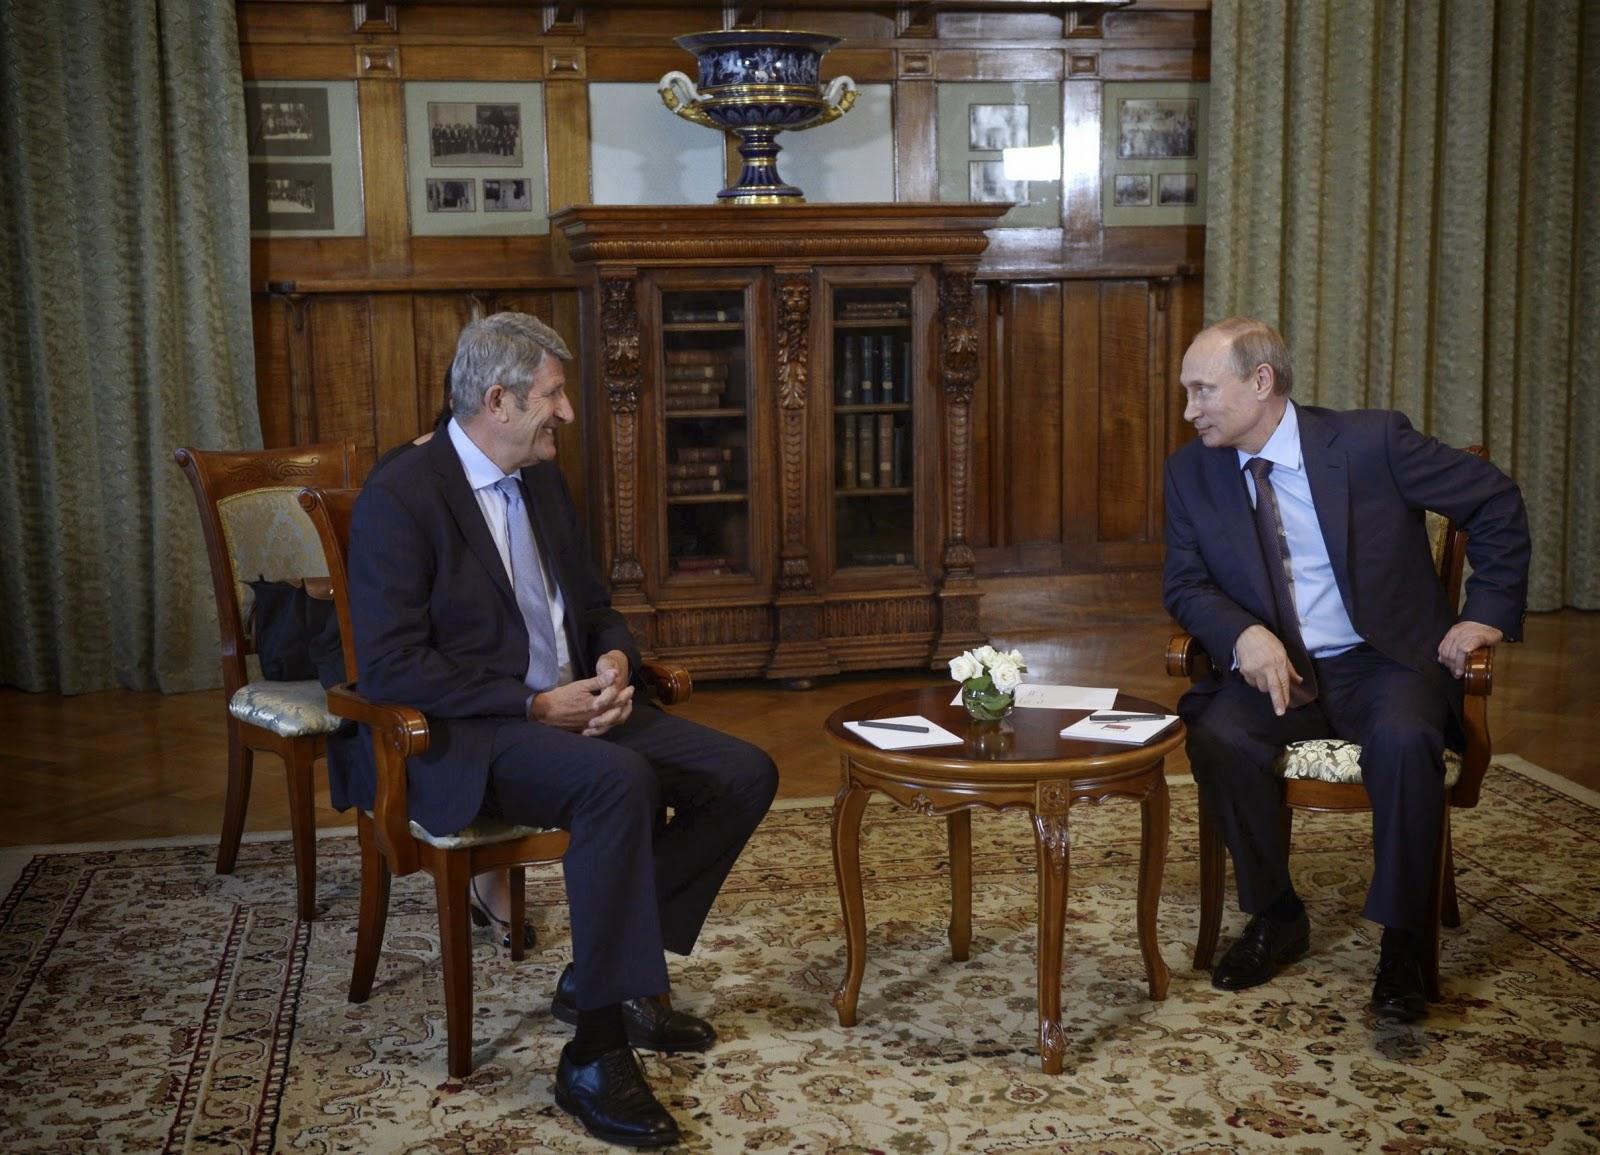 Philippe de Villiers and Vladimir Putin in August 2014